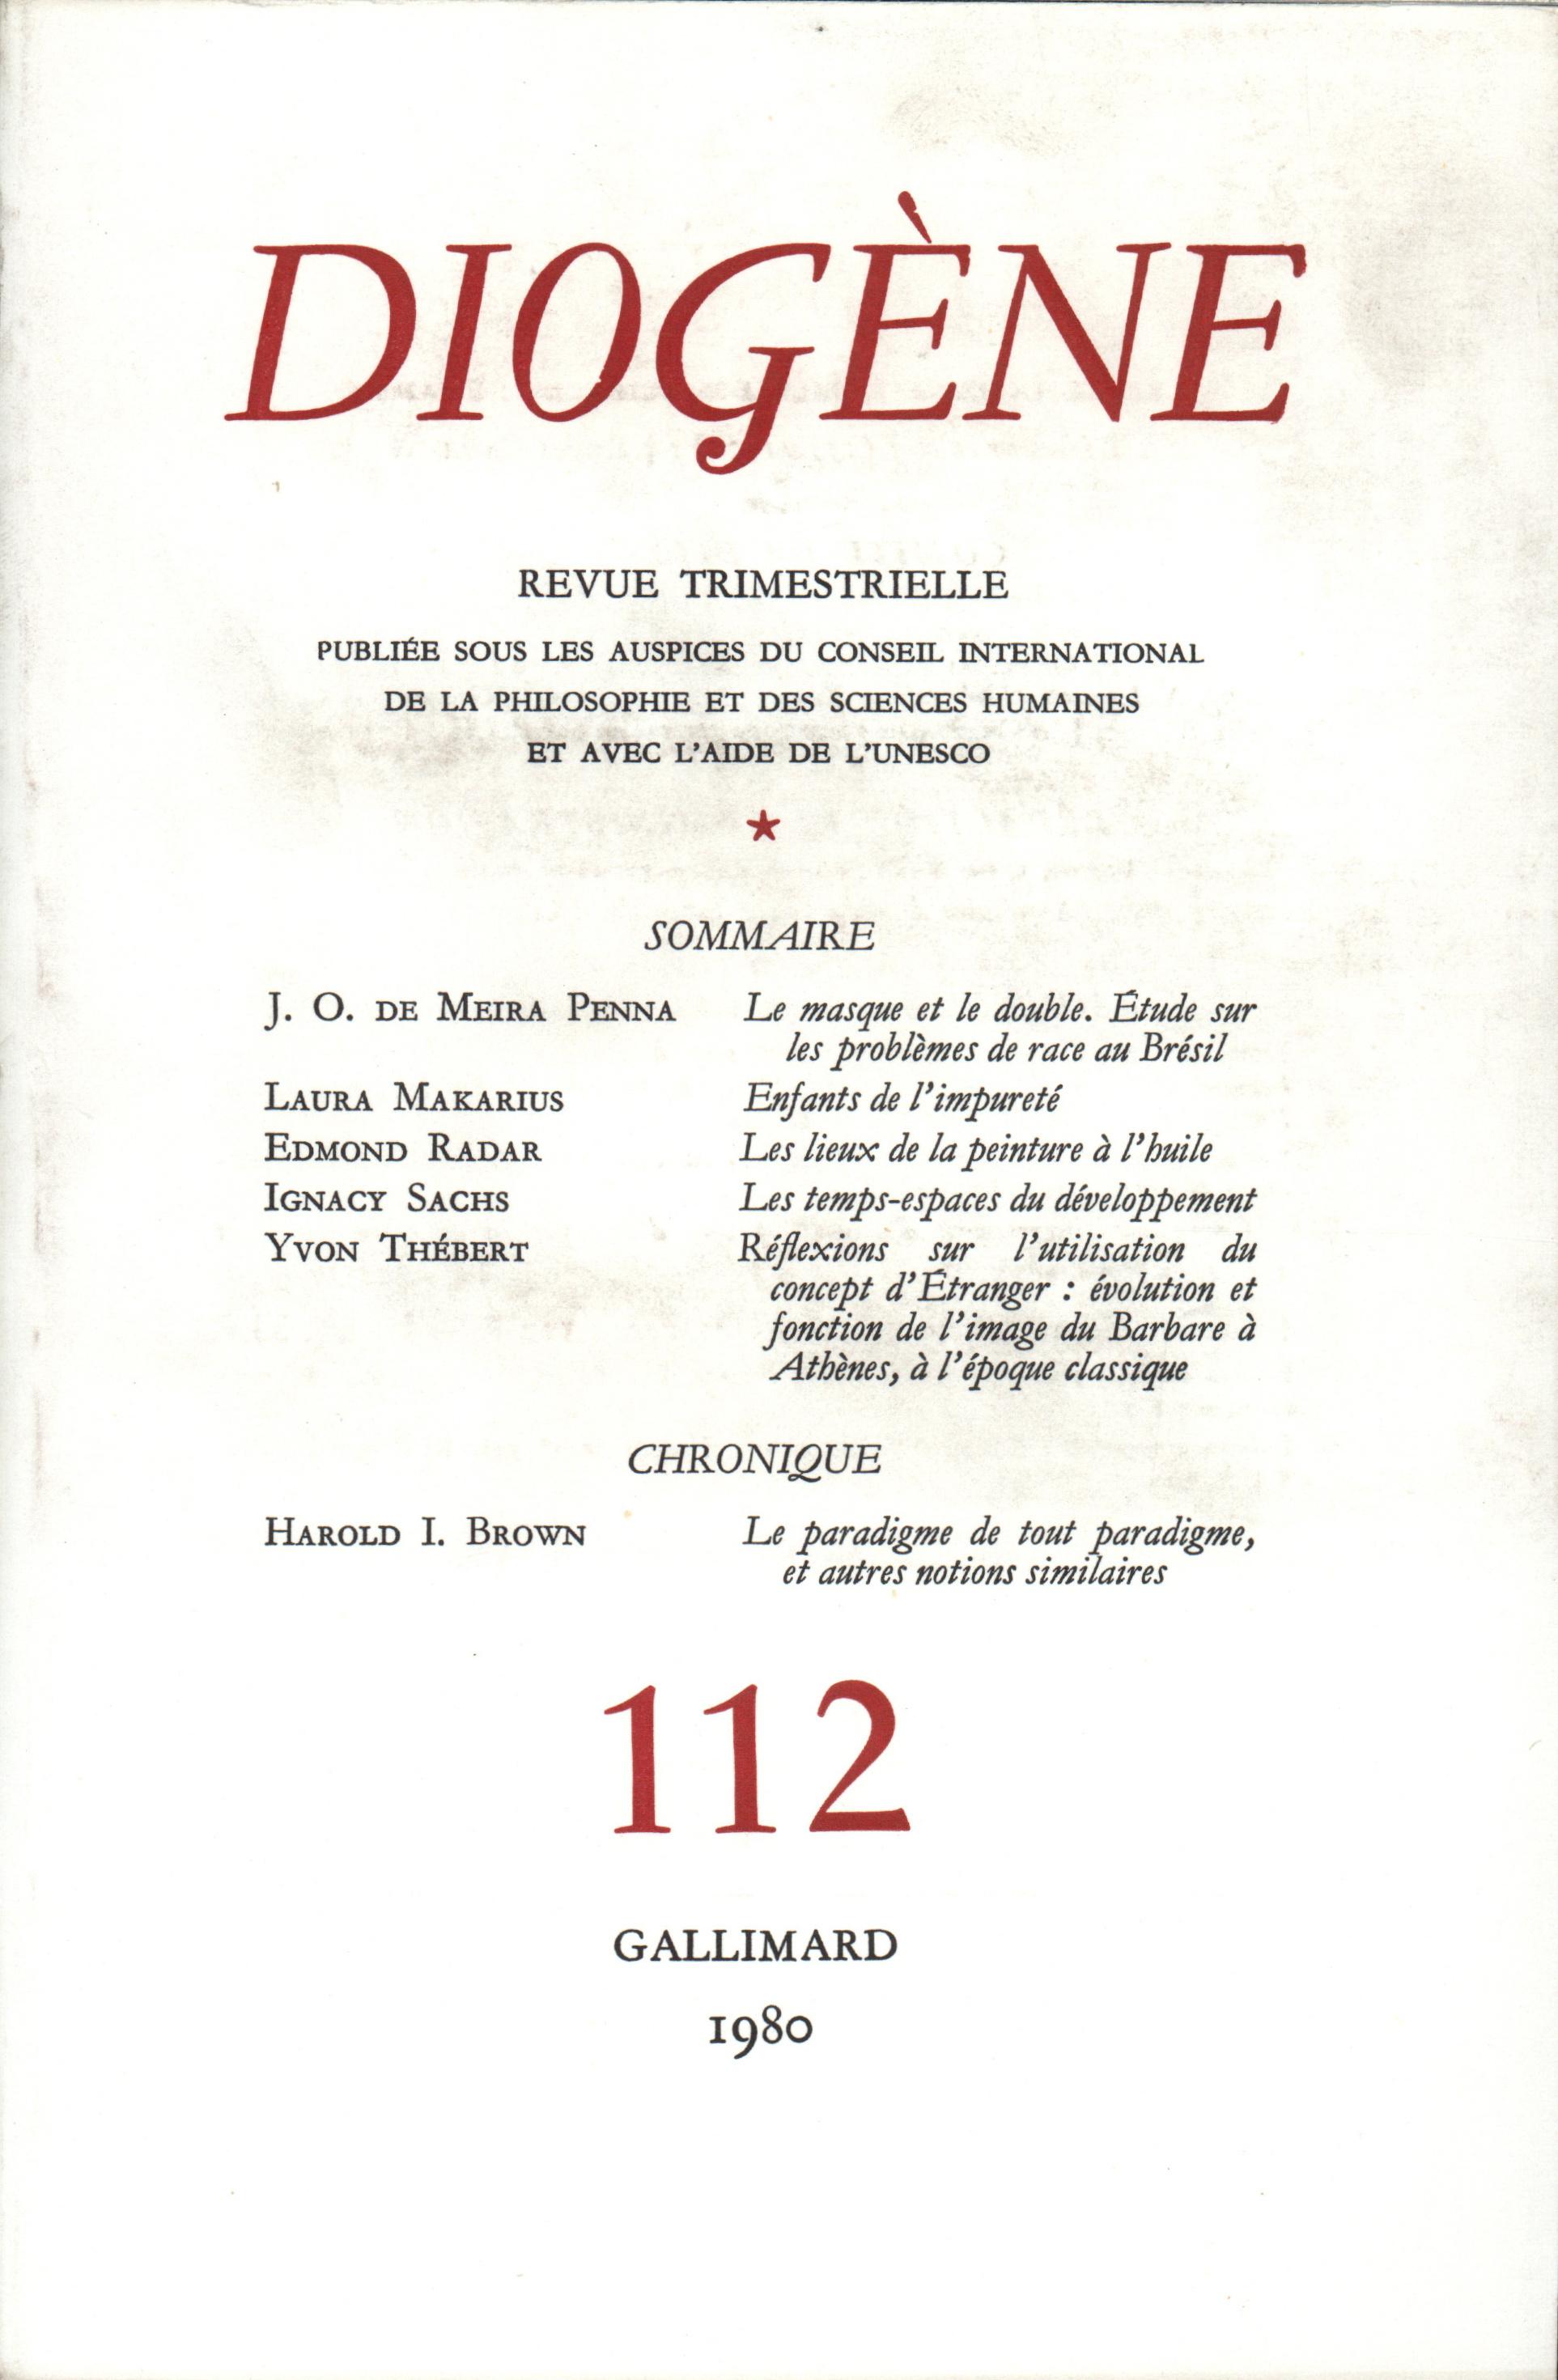 DIOGENE 112